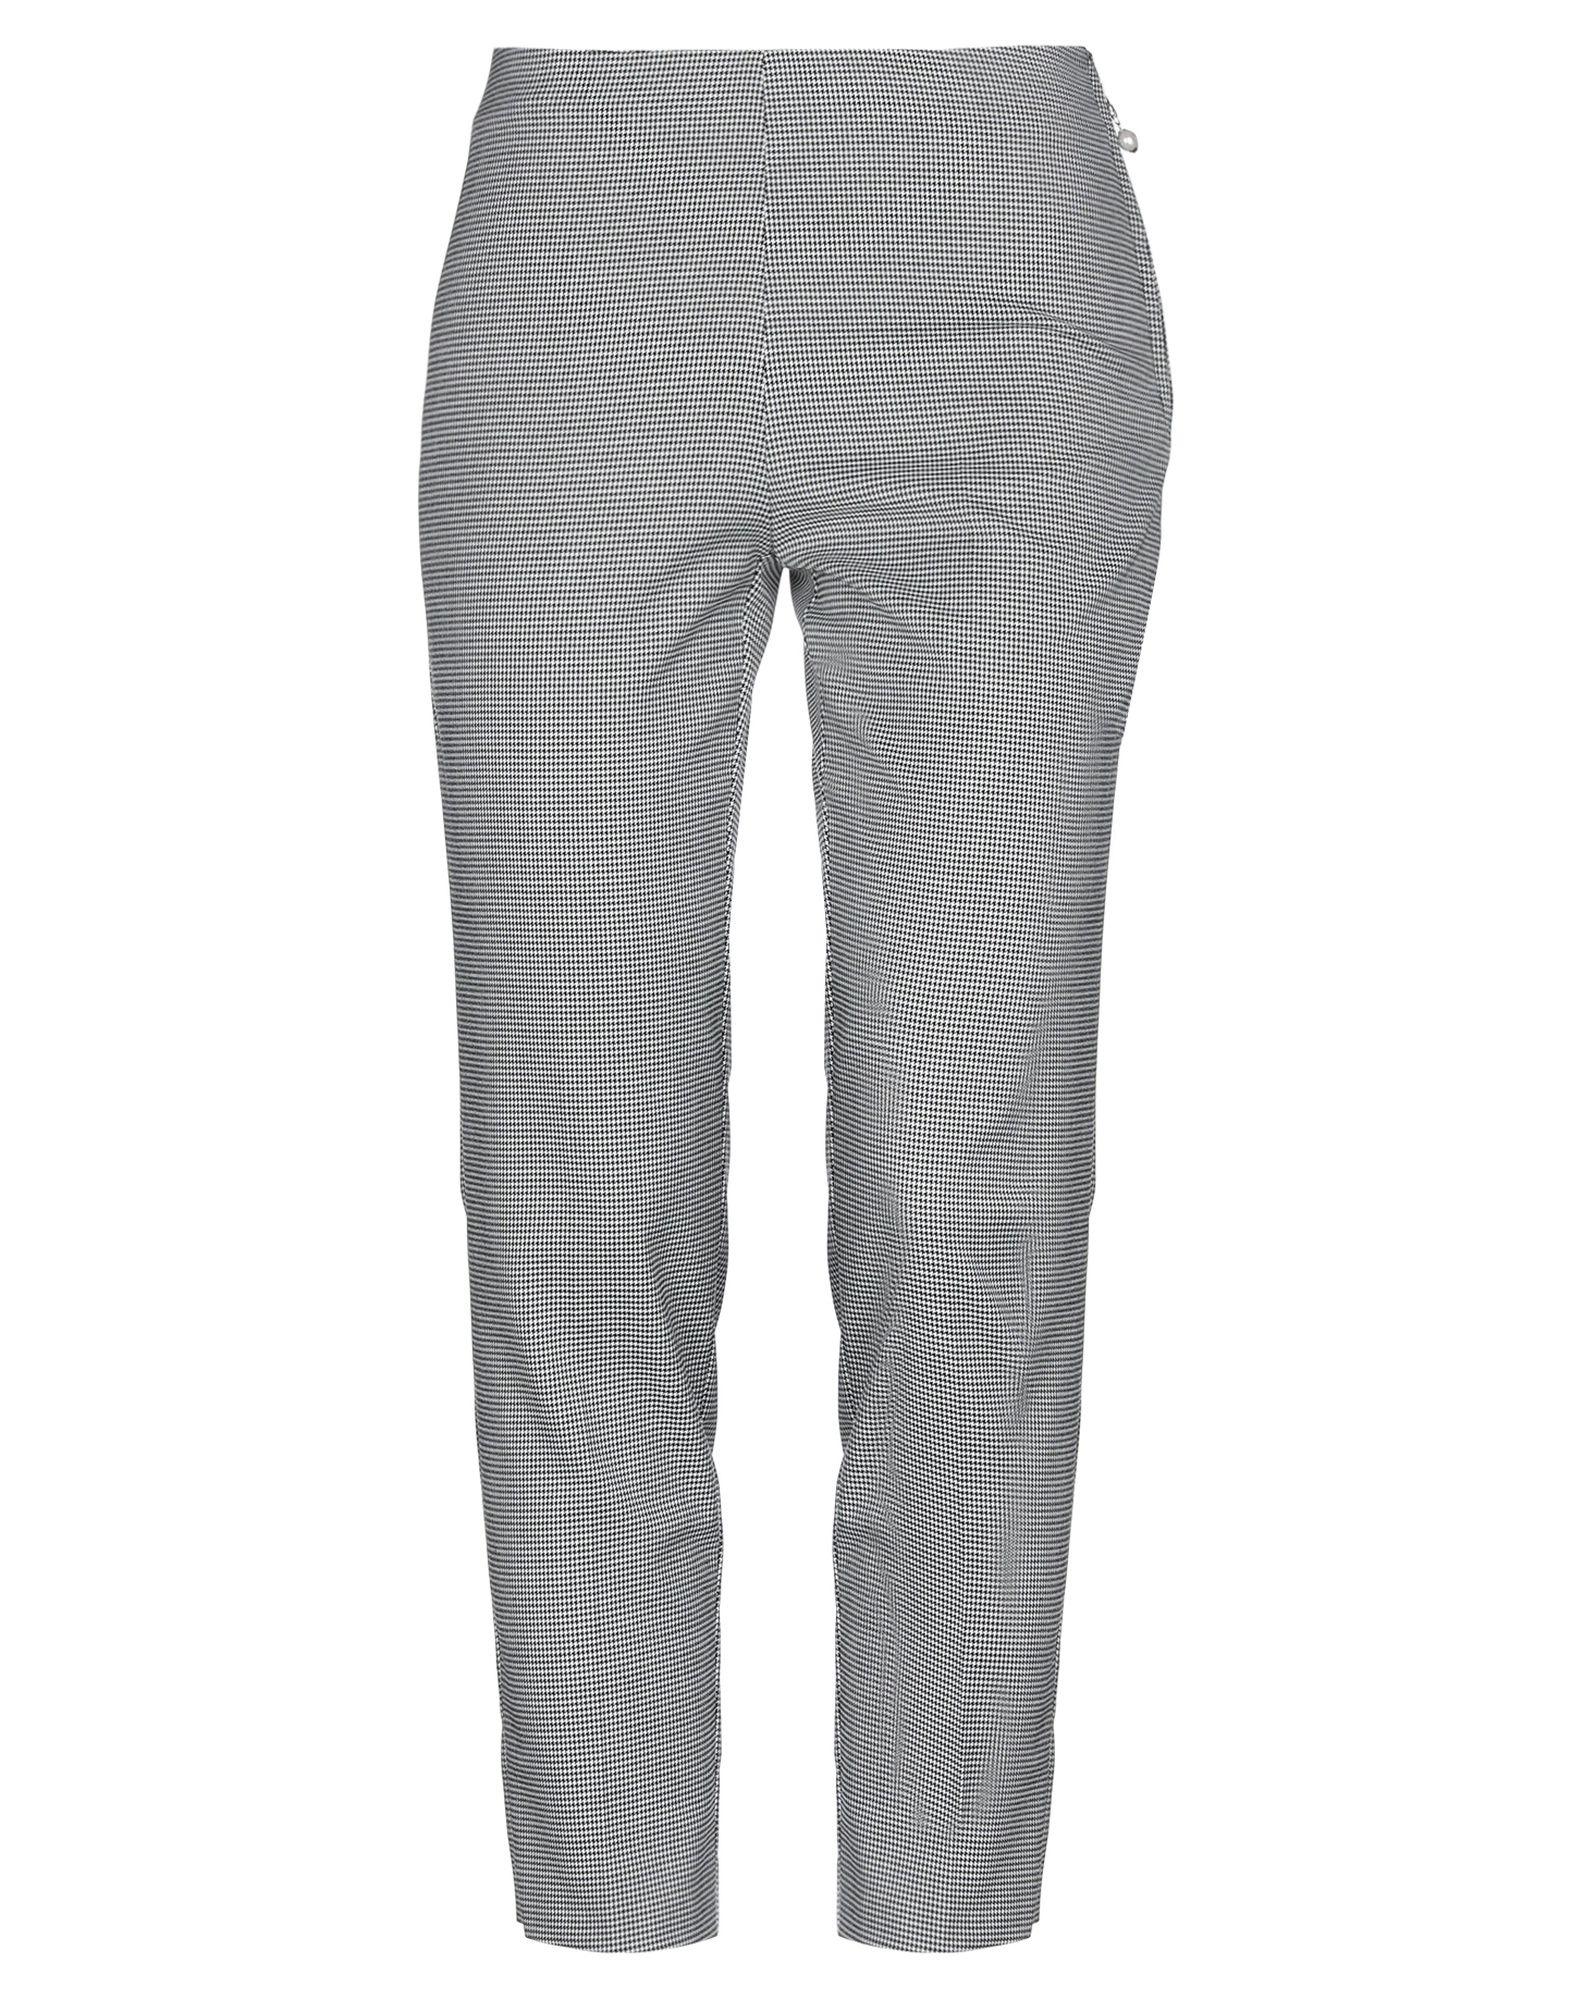 Pantalone Cristinaeffe damen - 13344630RO